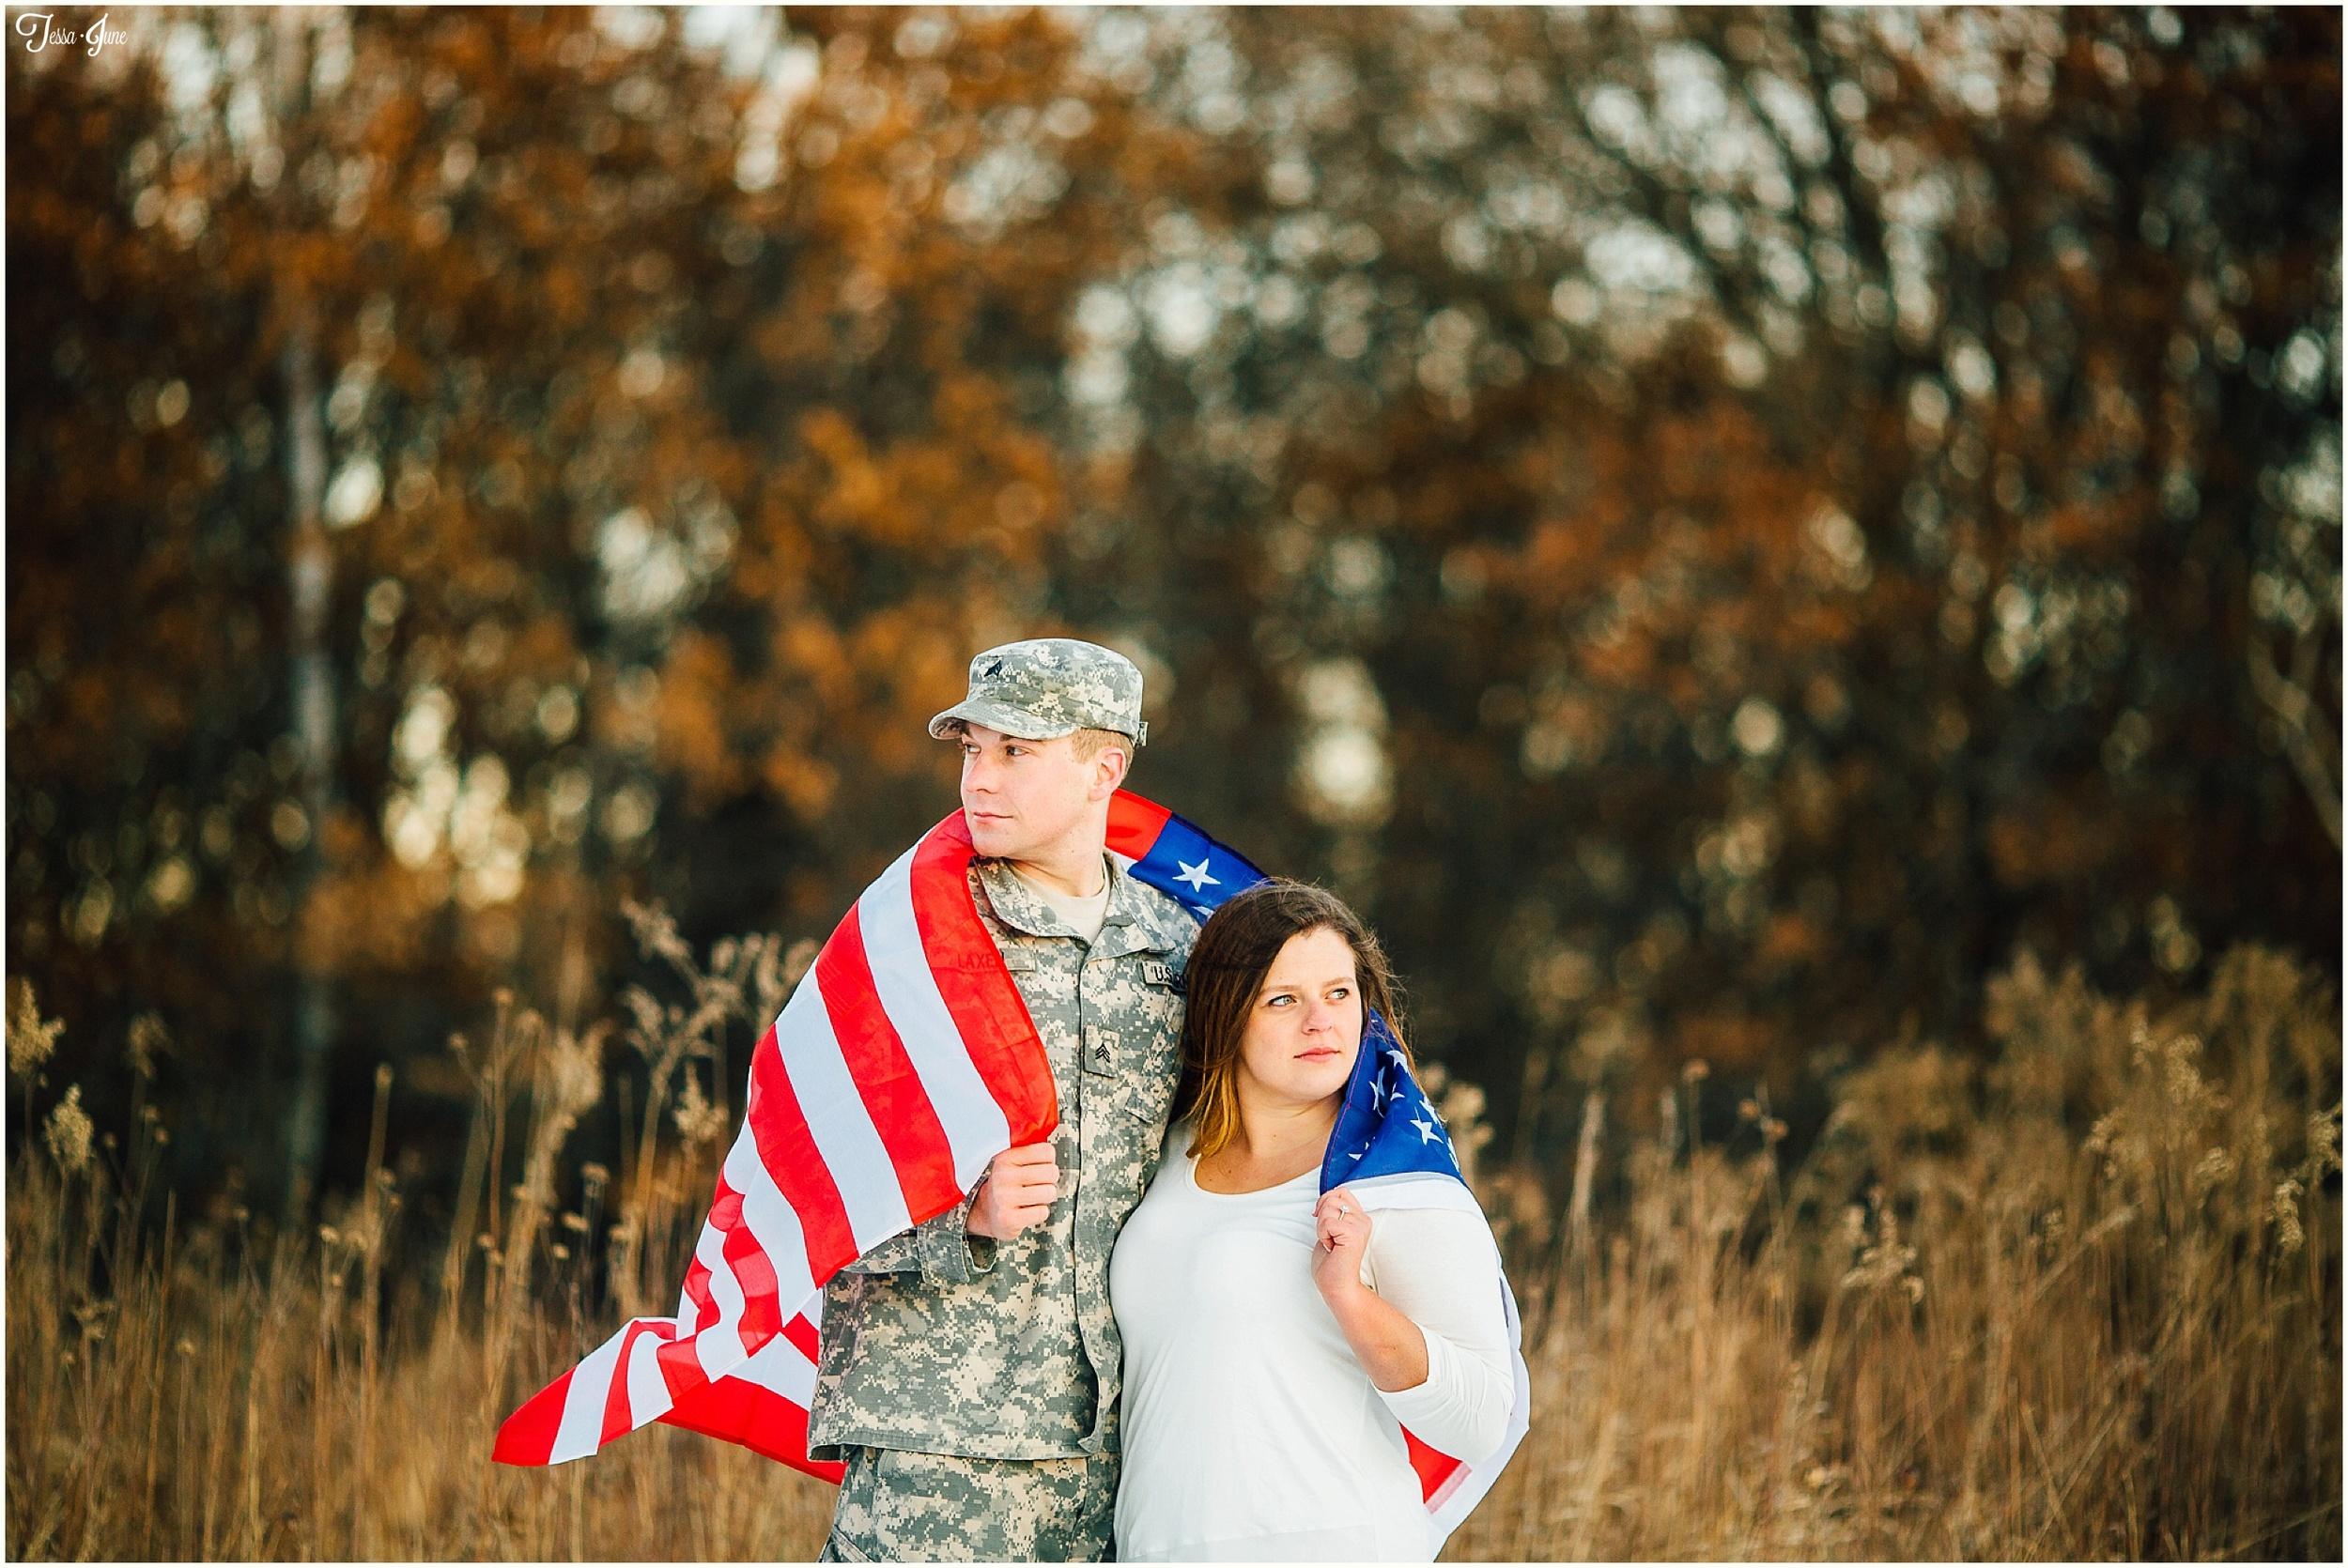 st-cloud-minnesota-wedding-photographer-waite-park-quarry-winter-army-flag